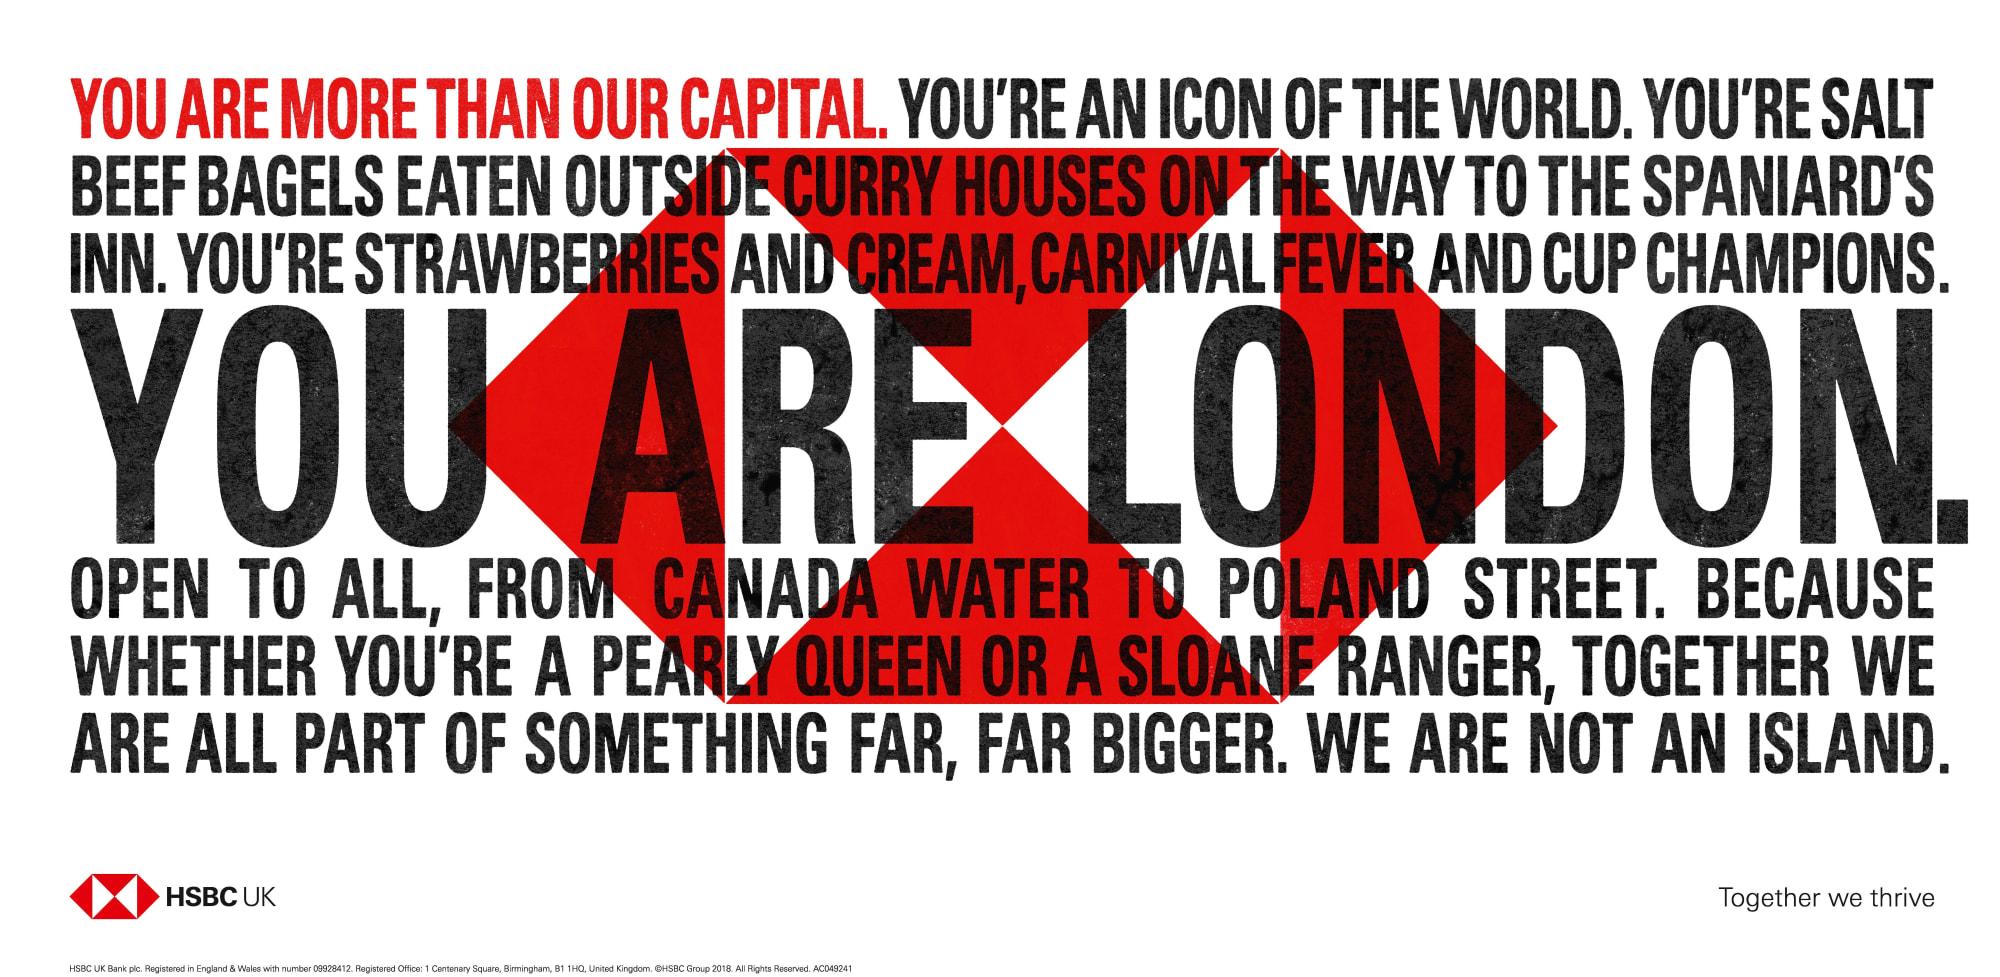 London HSBC We Are Not An Island London